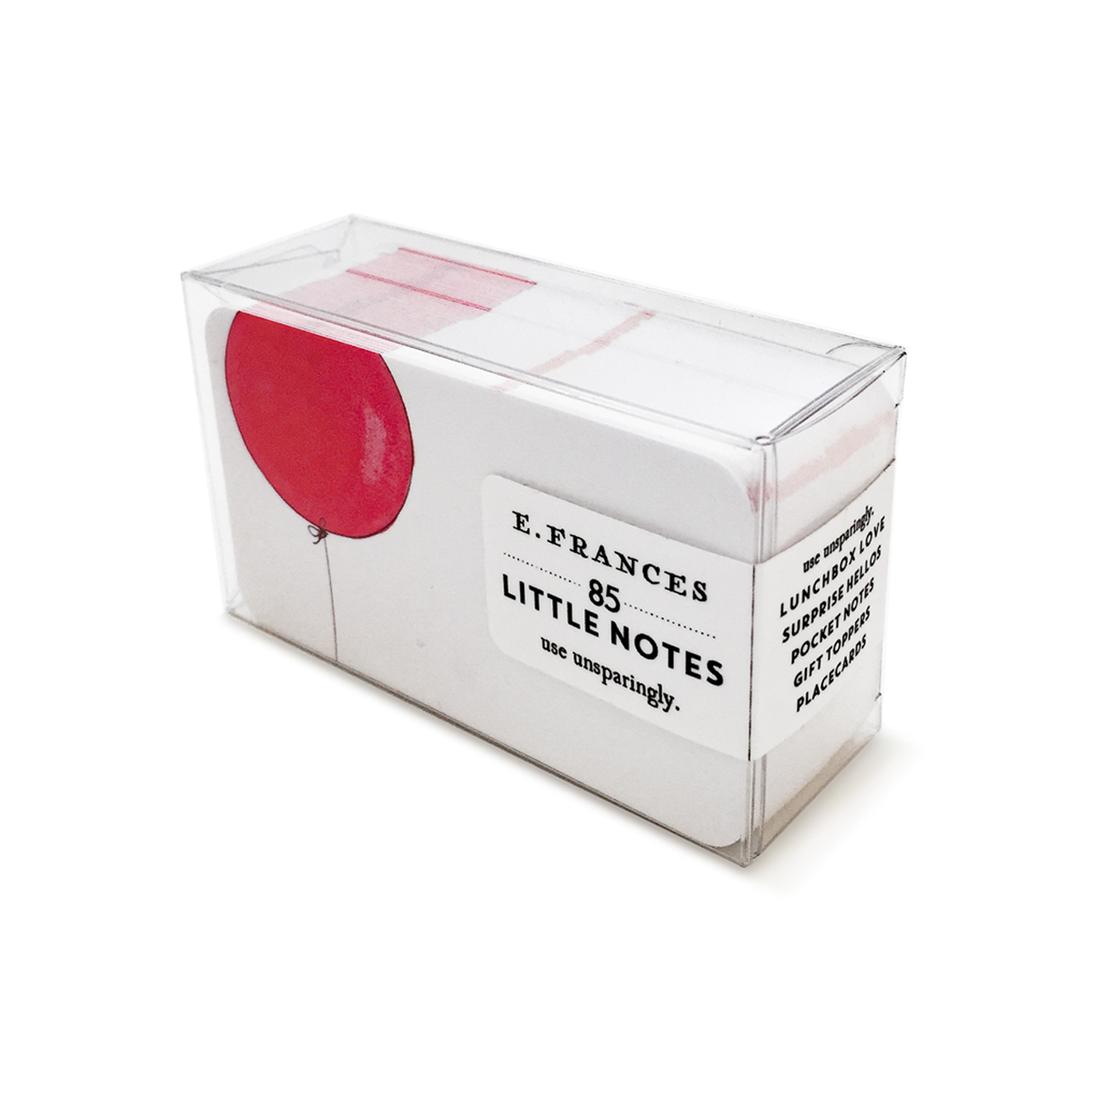 E. Frances Paper Studio EF ECMI - Balloon Little Notes, set of 85